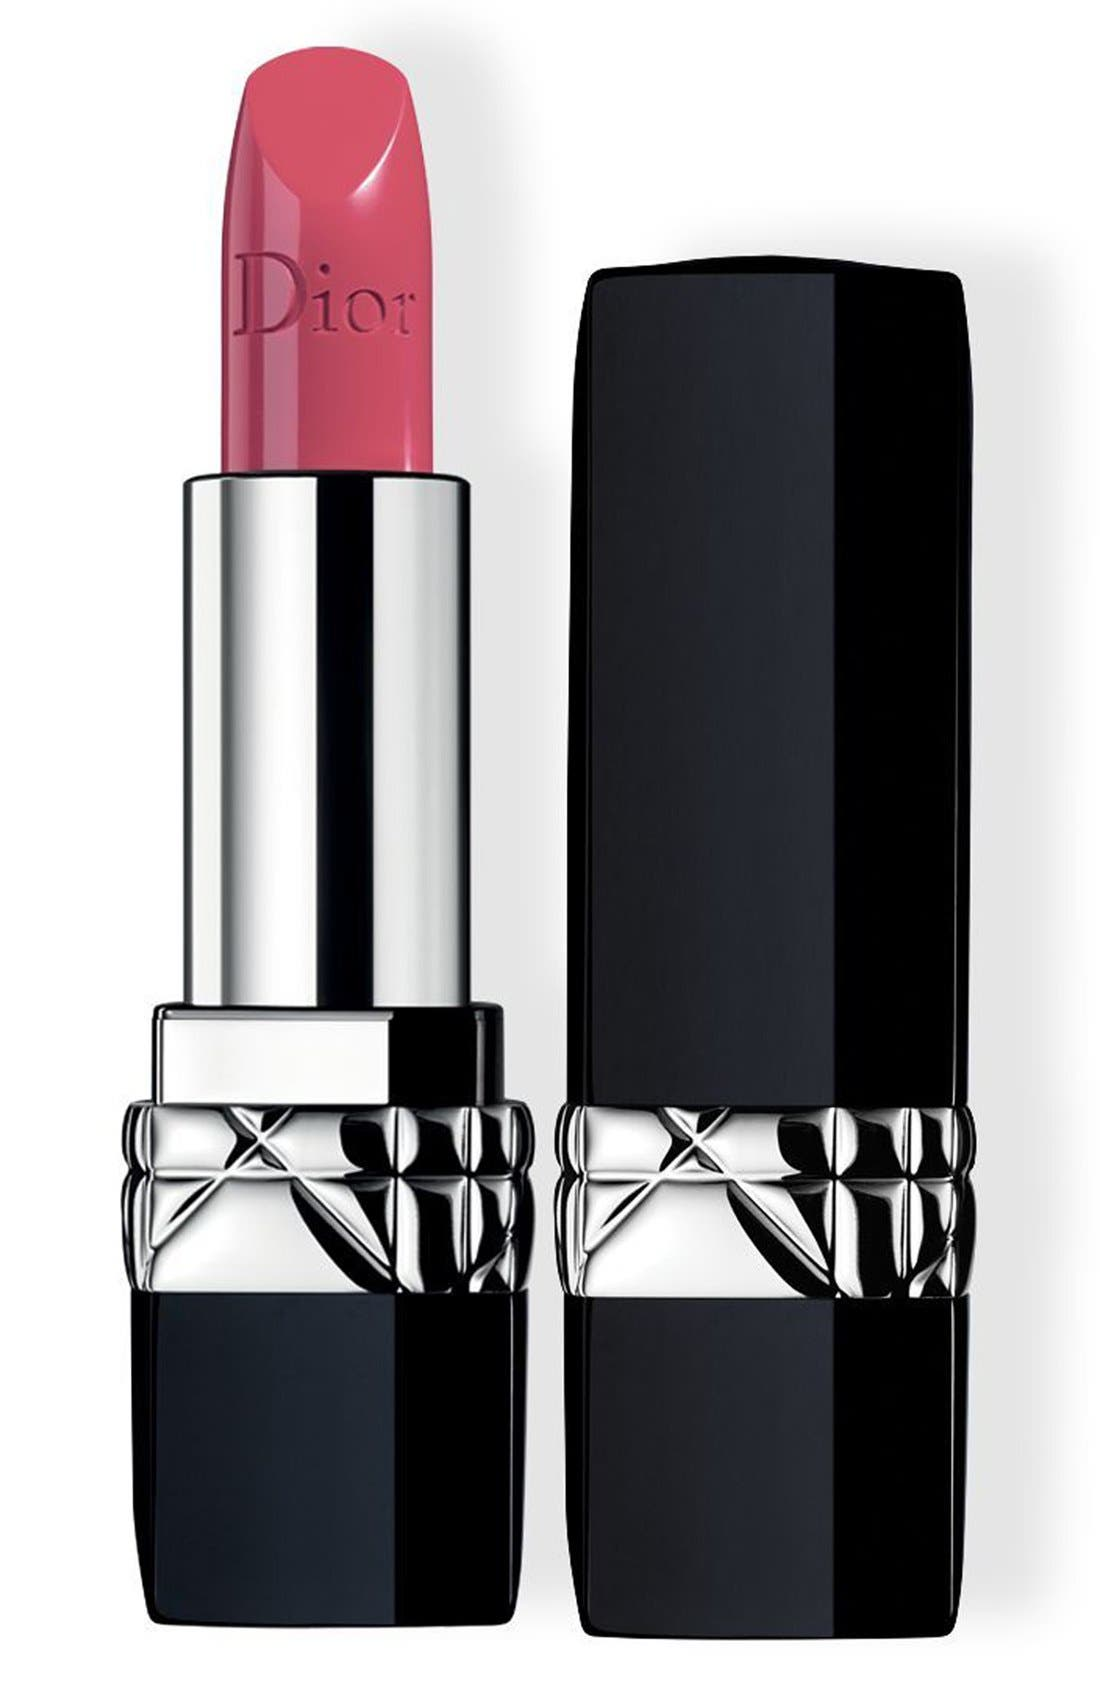 Dior Couture Color Rouge Dior Lipstick - 672 Adoree